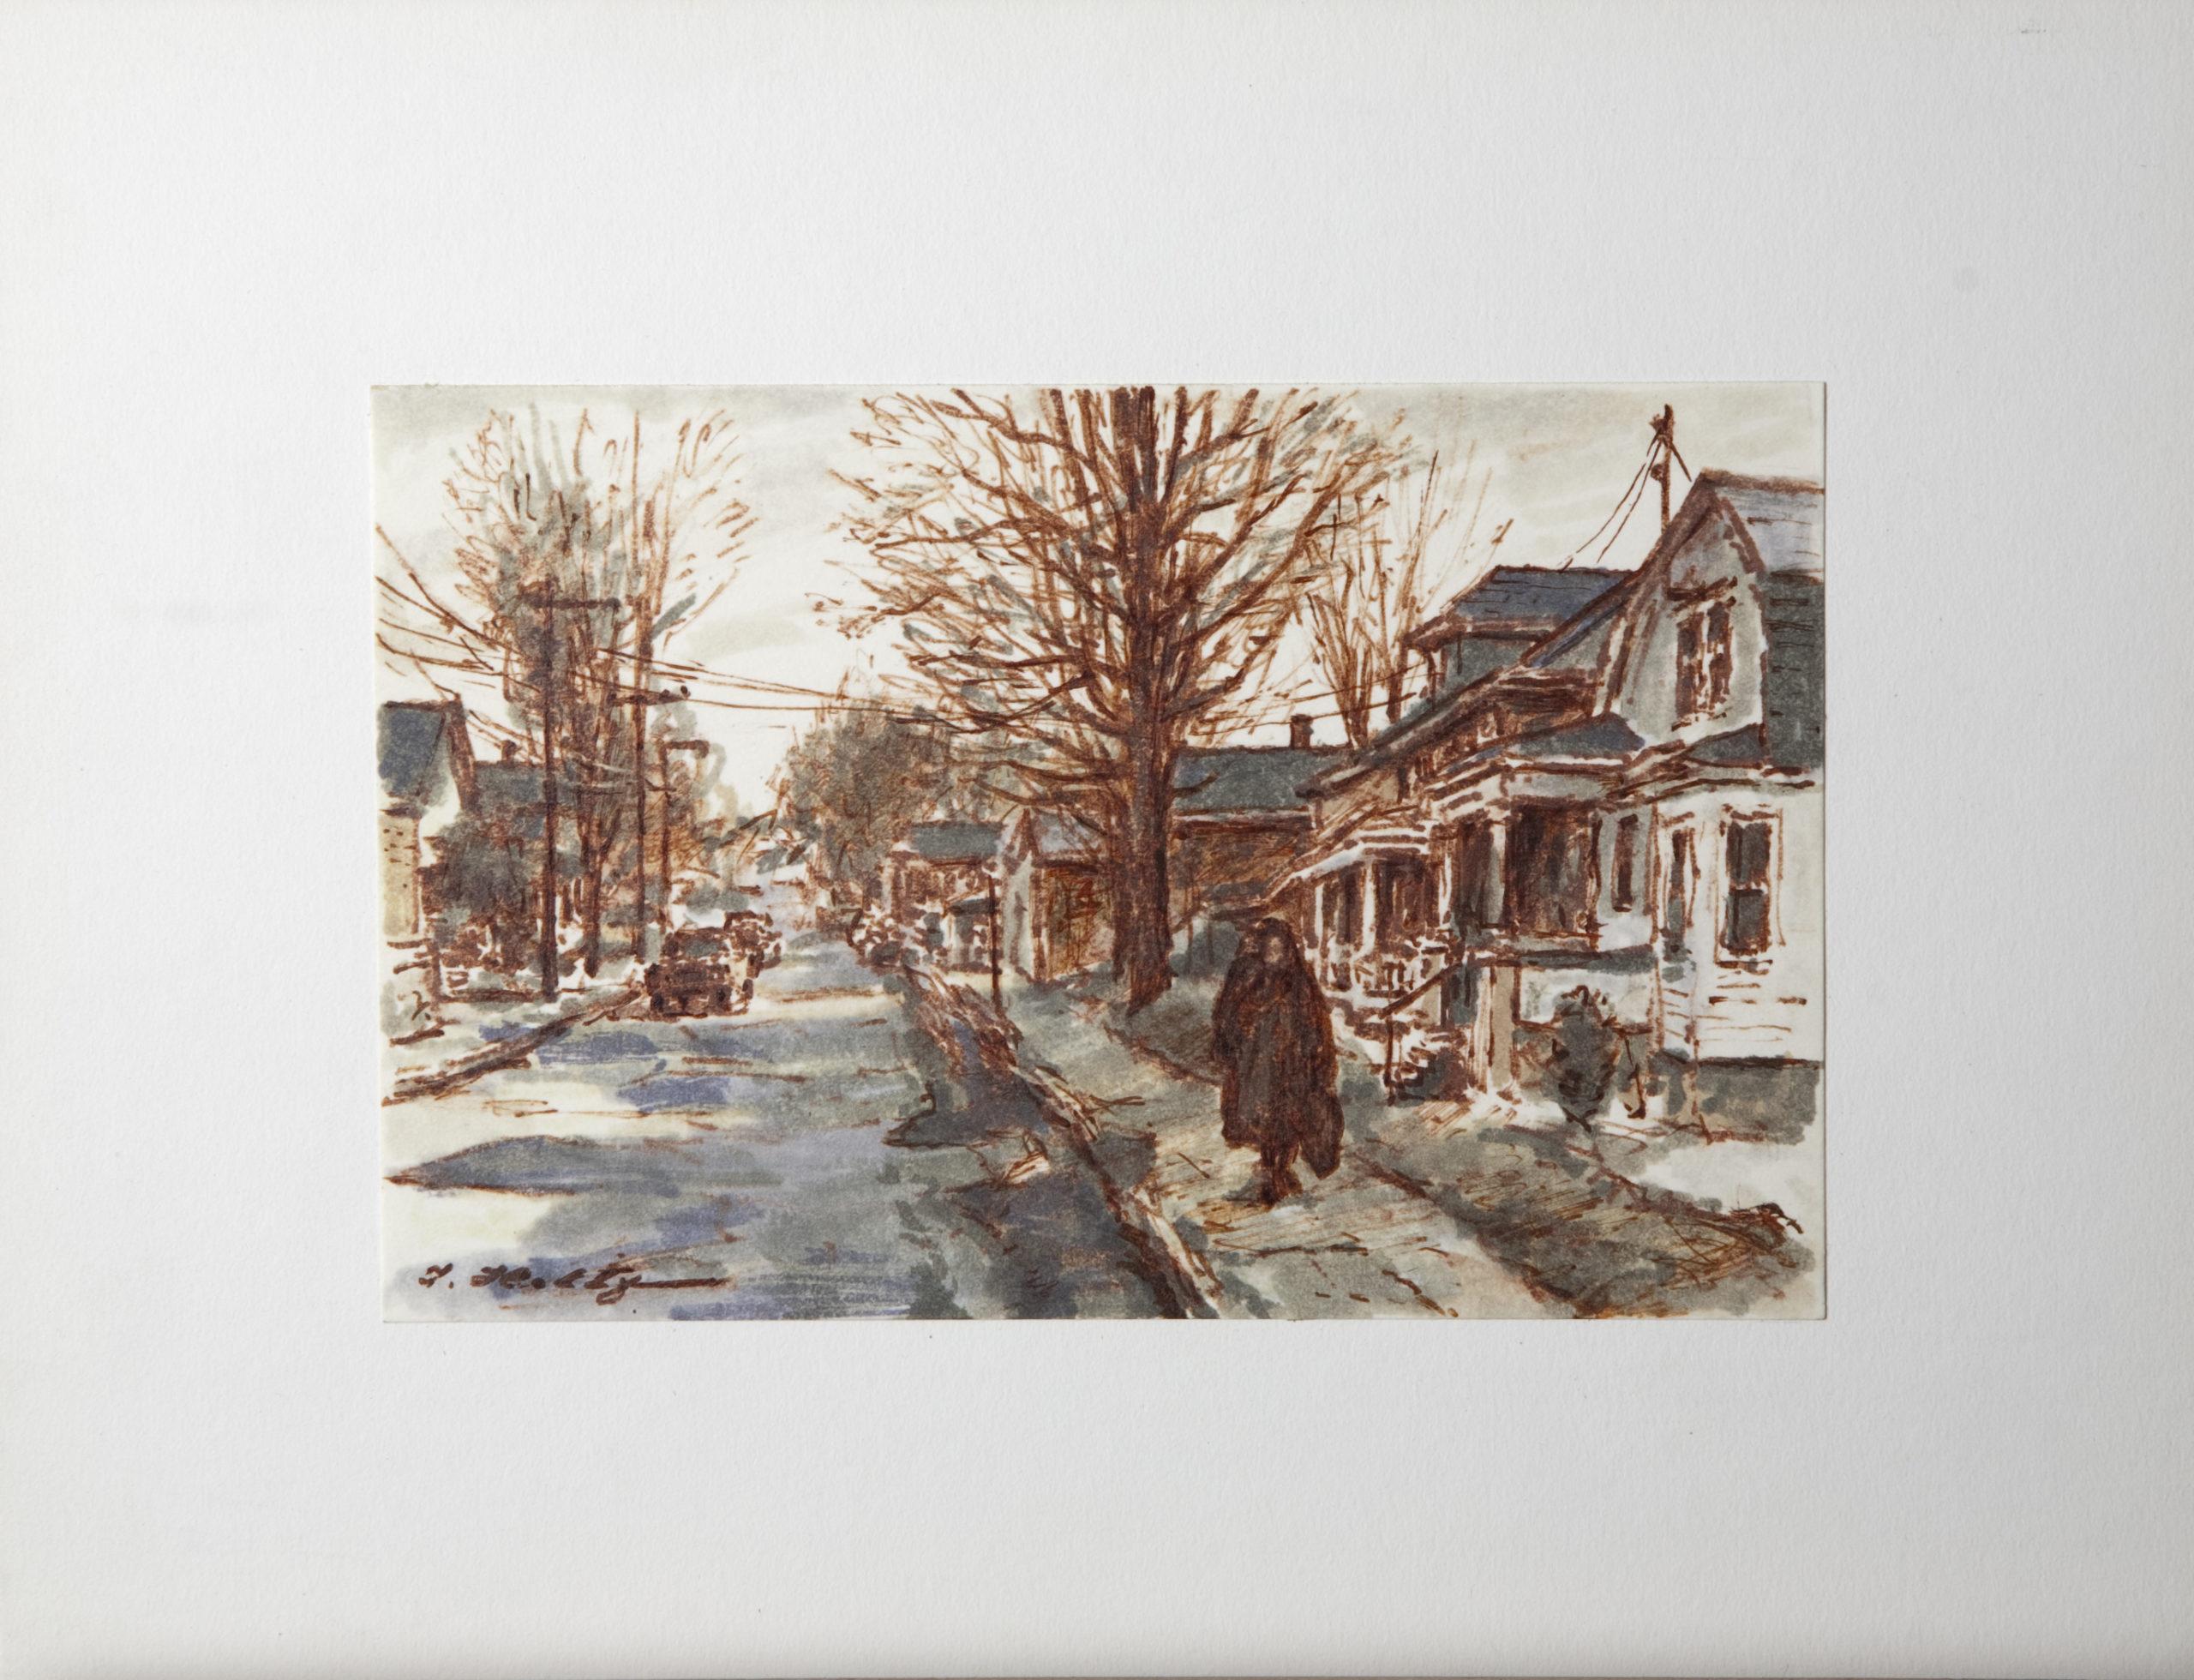 D30 Residential Street in Winter - Colored Marker - 8.5 x 5.5 - Matt: 12.75 x 10 - No Frame